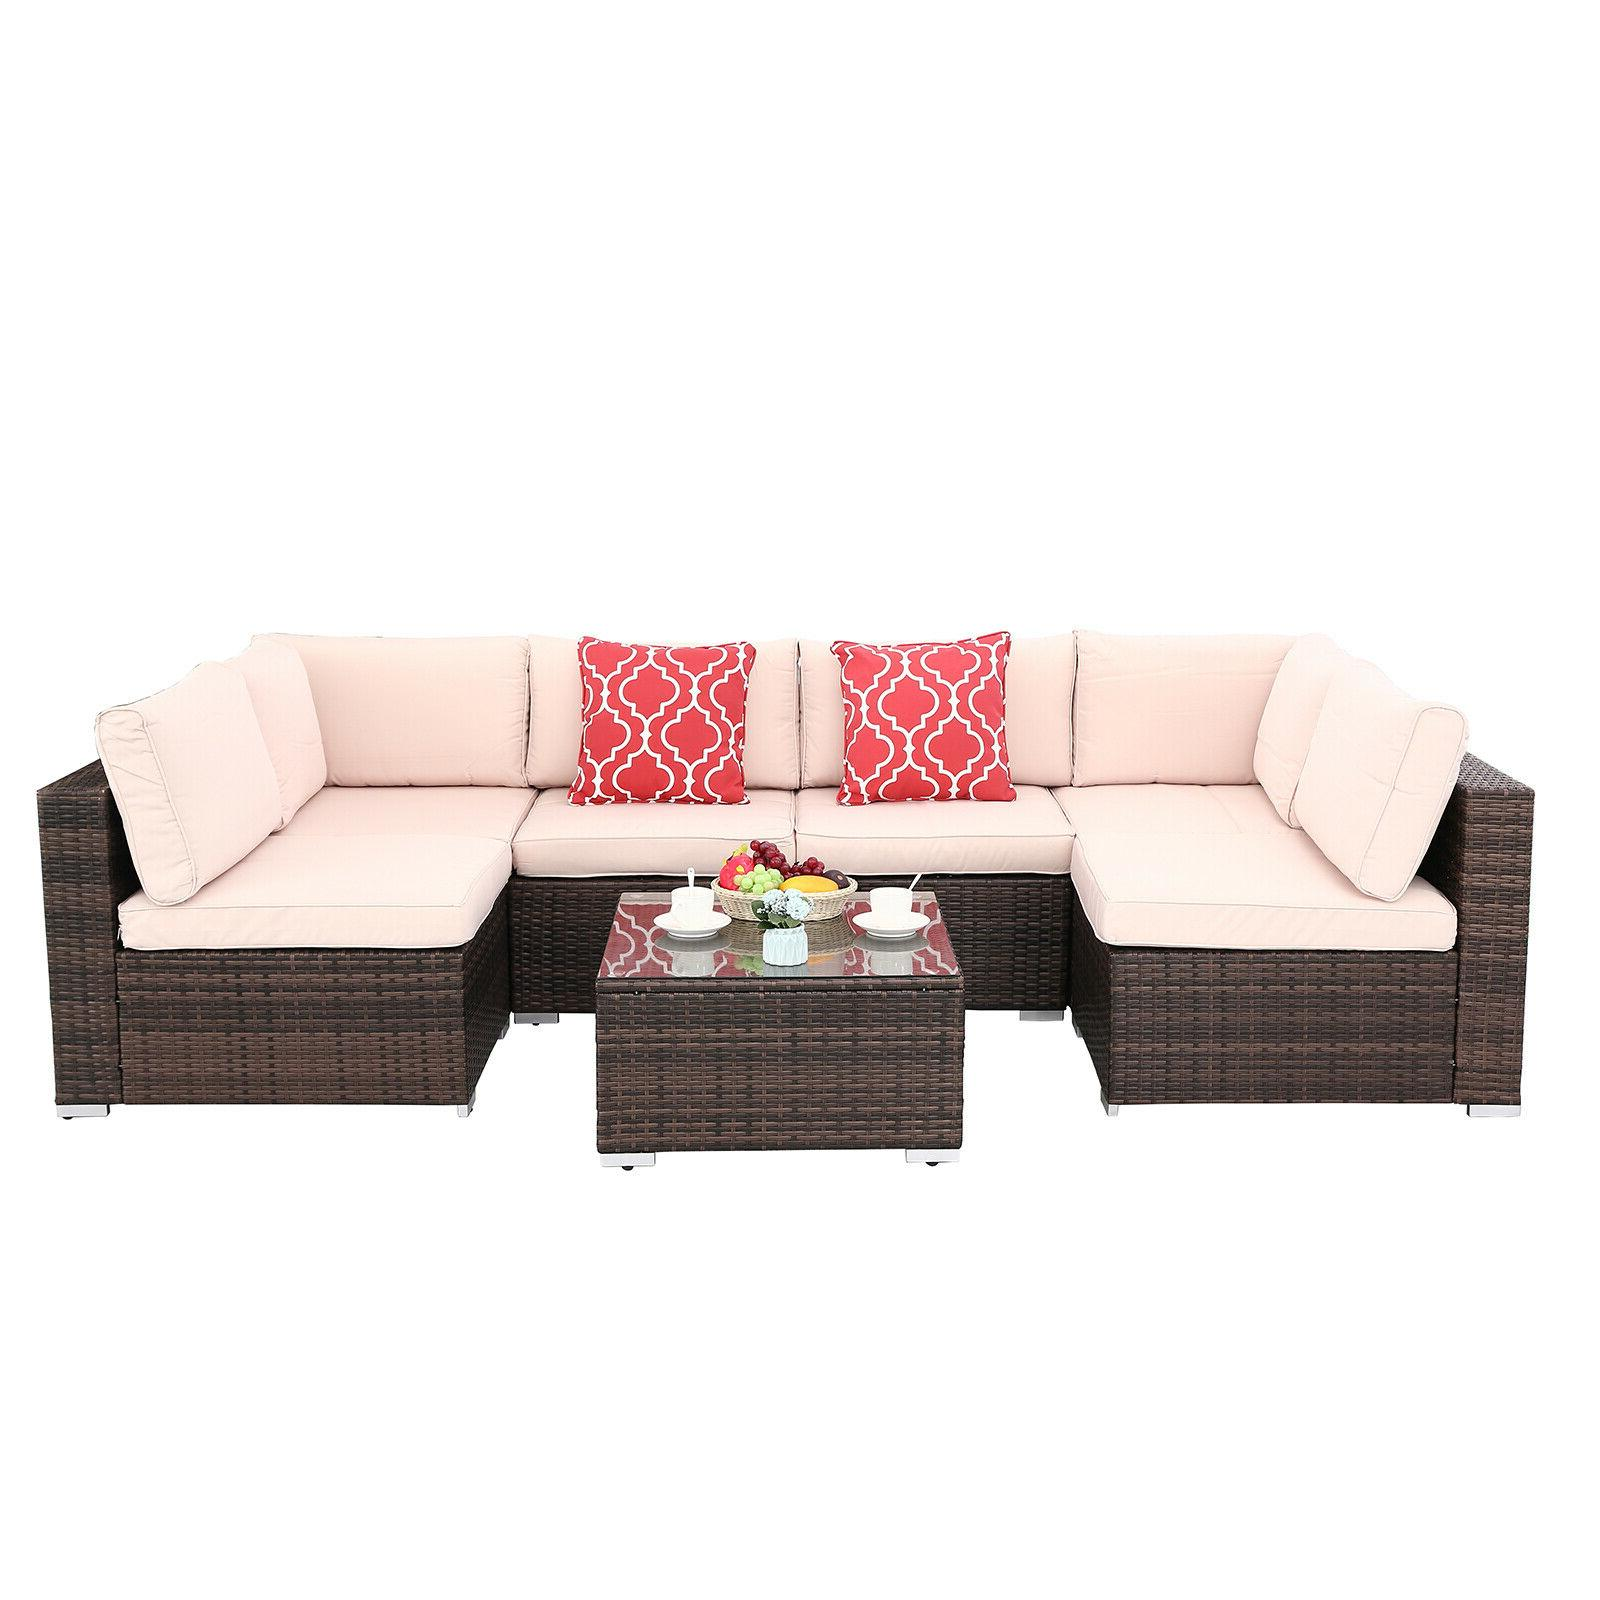 7pcs Patio Set Rattan Wicker Sectional Furniture